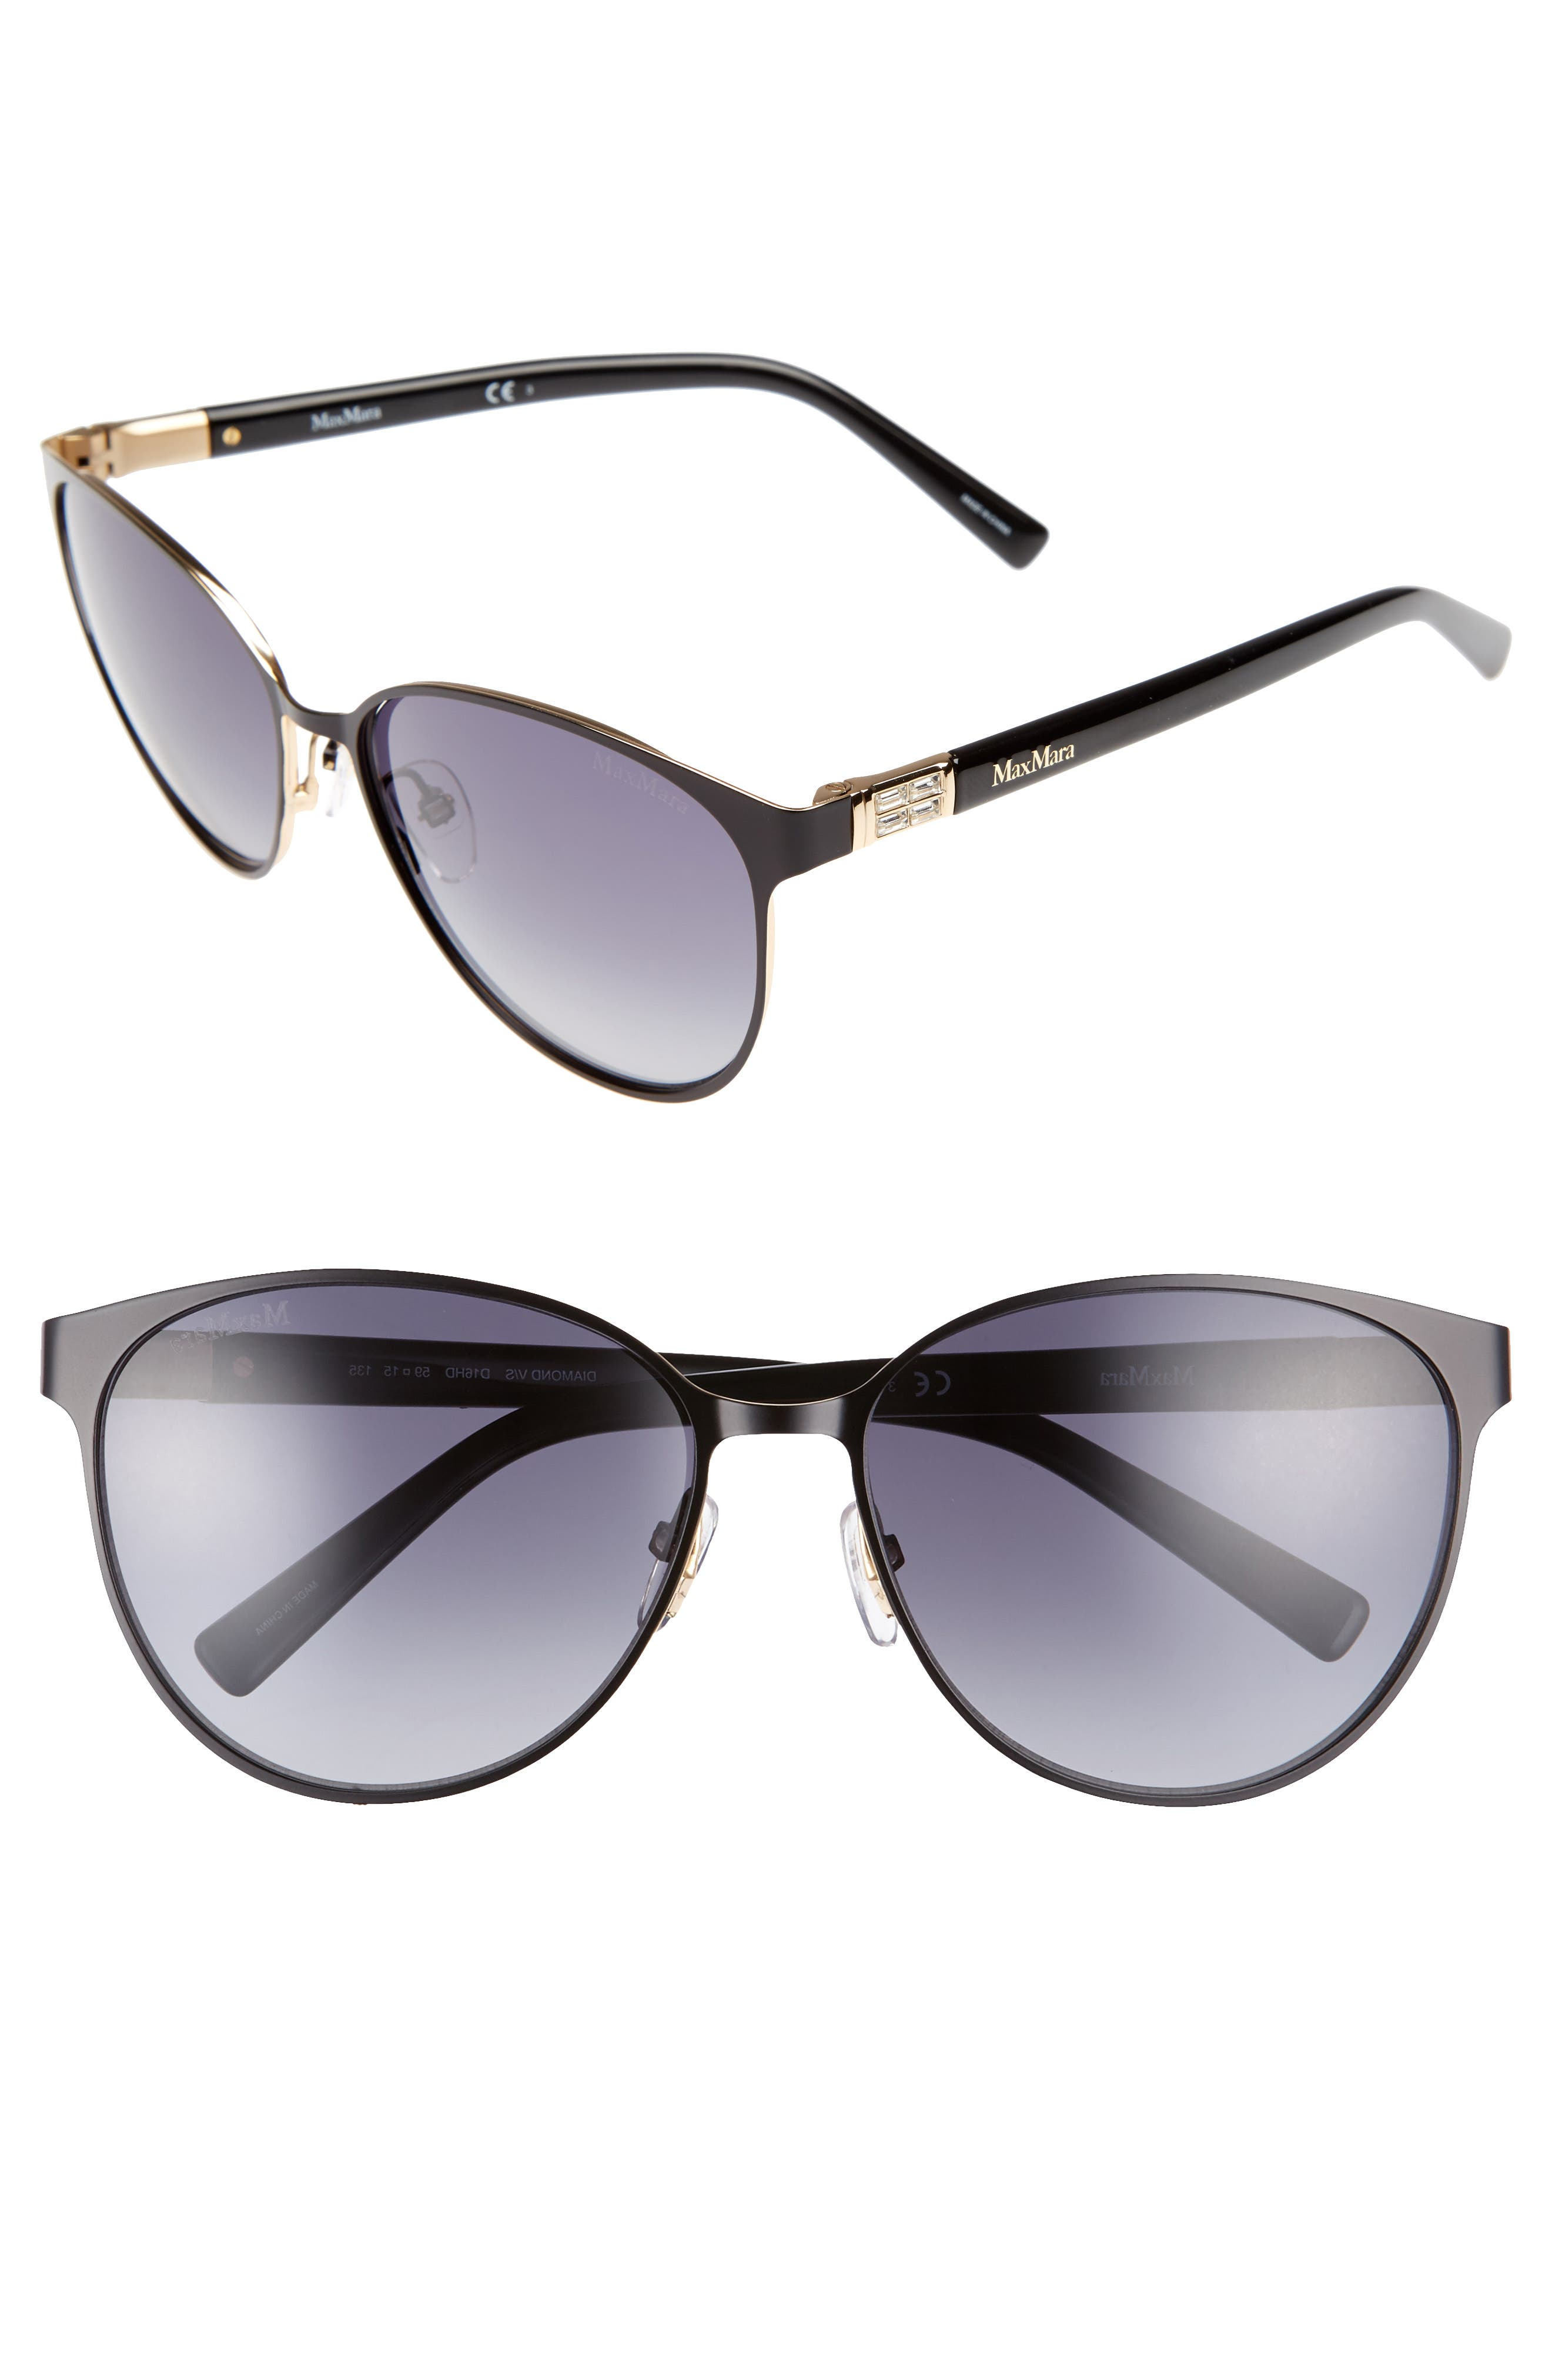 Diamov 59mm Gradient Cat Eye Sunglasses,                             Main thumbnail 1, color,                             MATTE BLACK